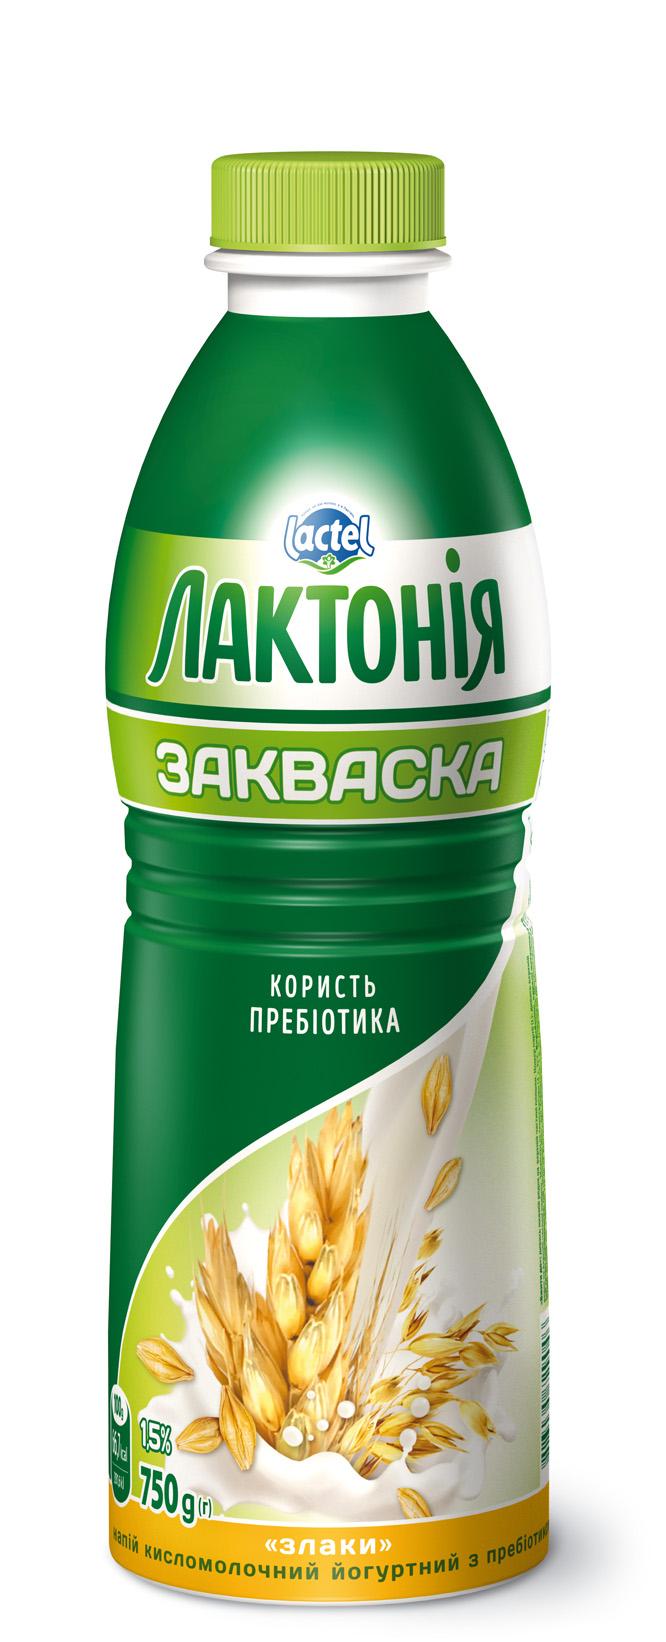 "Dairy yogurt  drink ""Zakwaska""   Cereals 1,5%,  ""Lactonia"" (Bottle 0,750)"